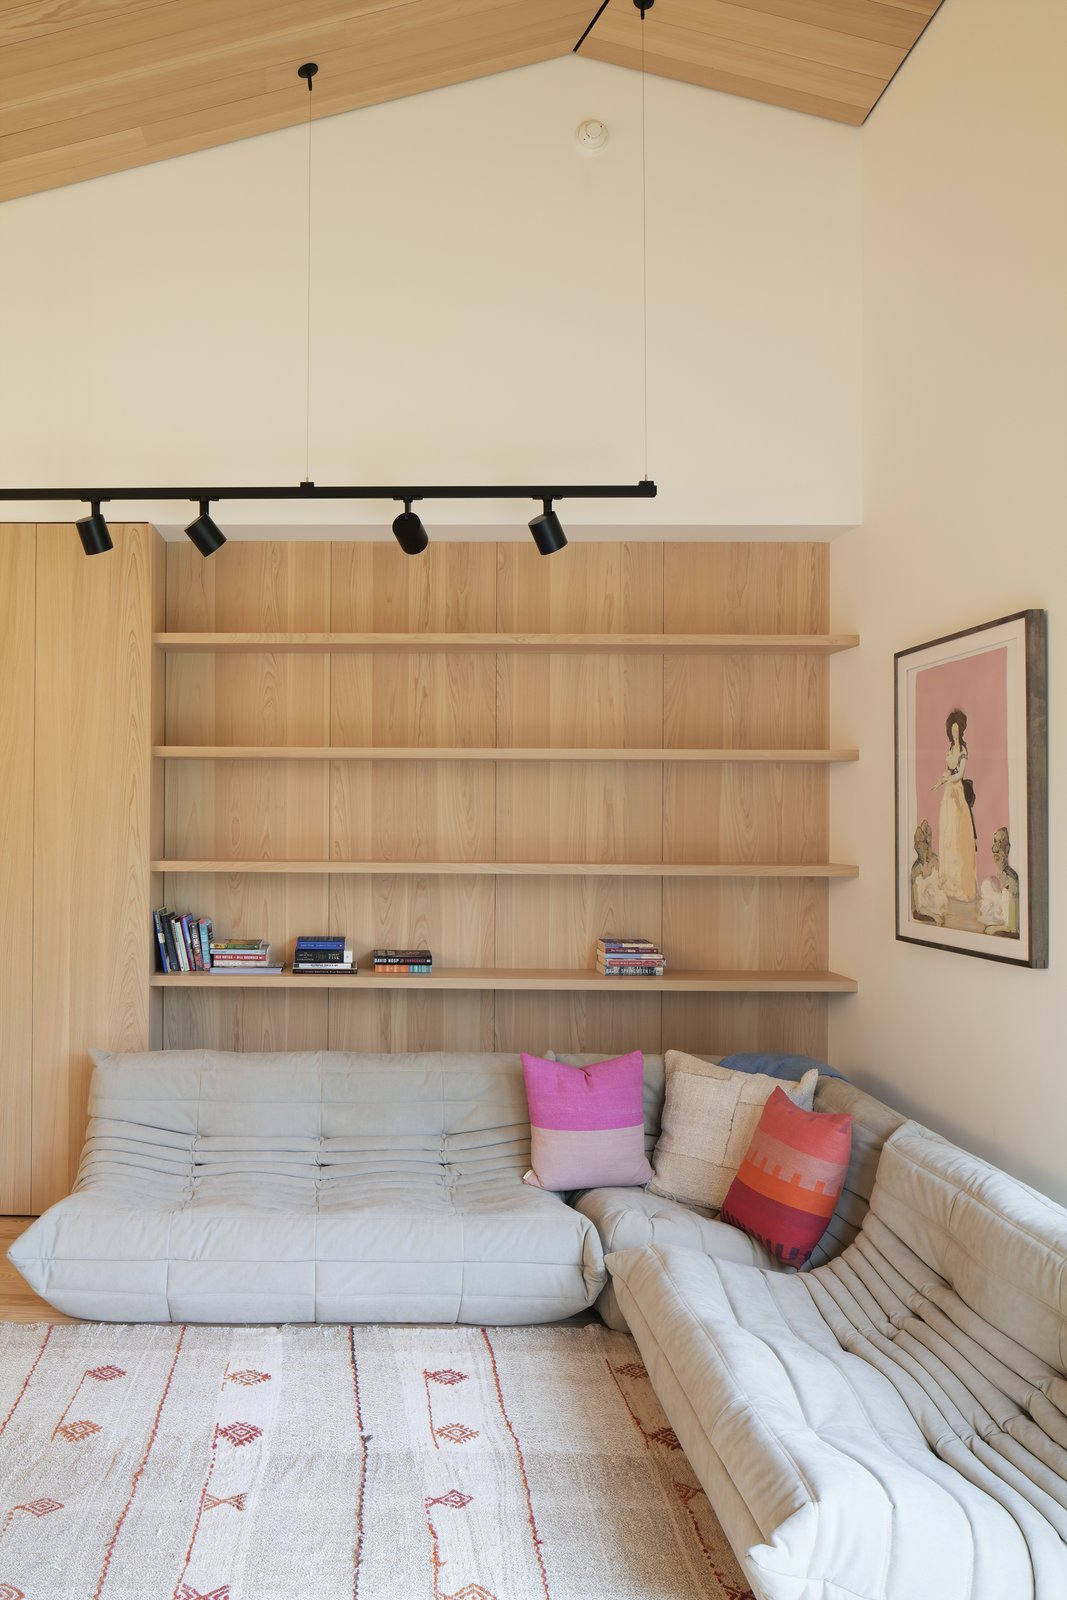 Martha's Vineyard House by Anmahian Winton Architects family room